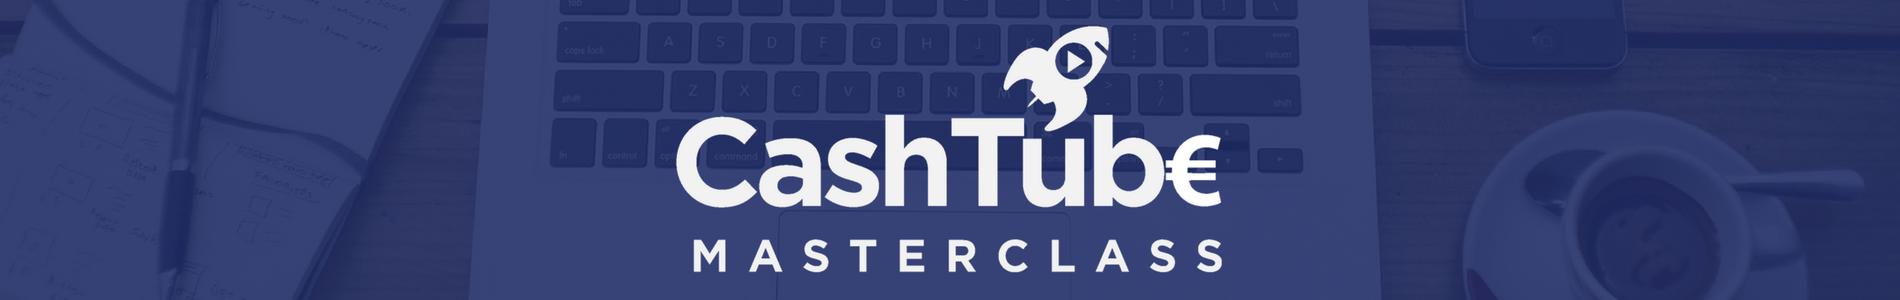 CashTube Masterclass